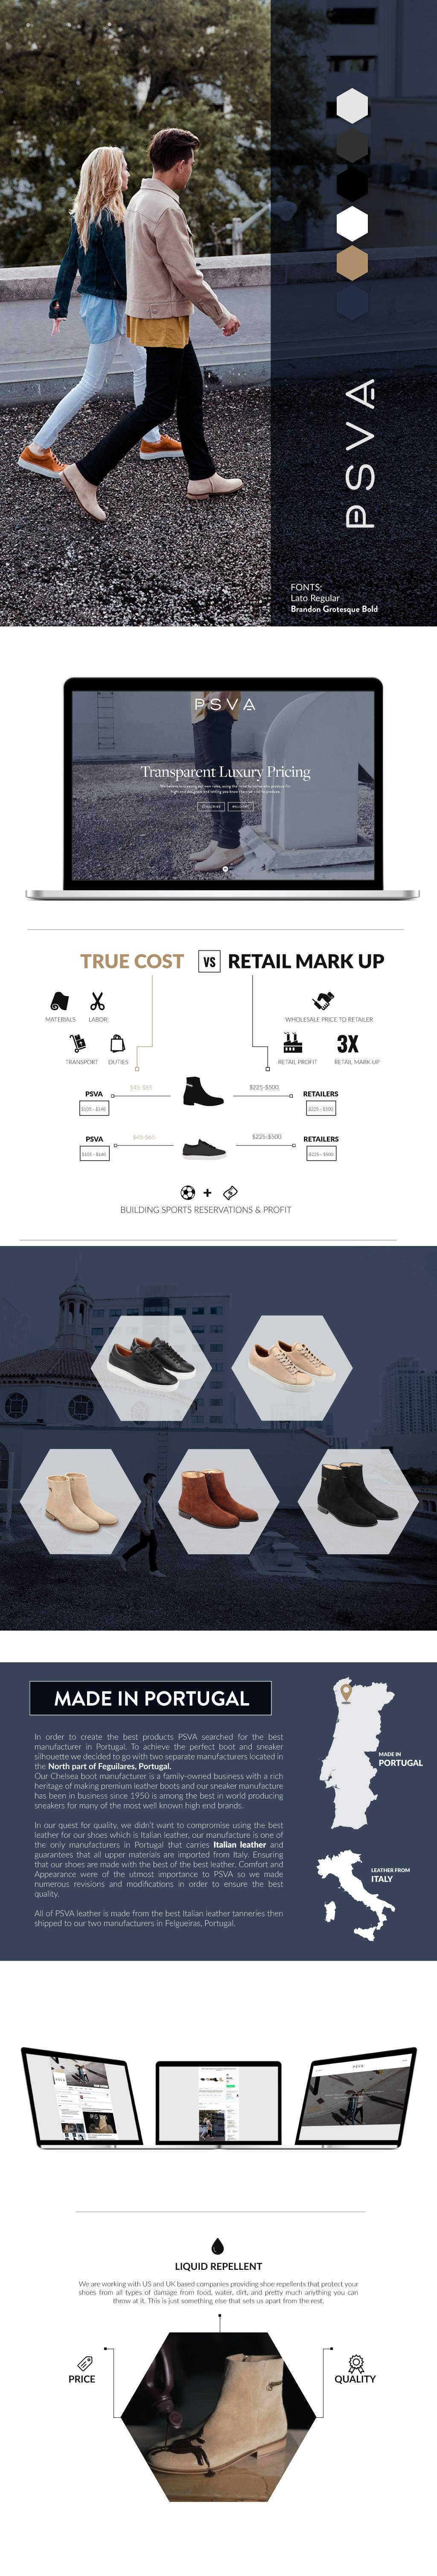 psva Direct fashion brand